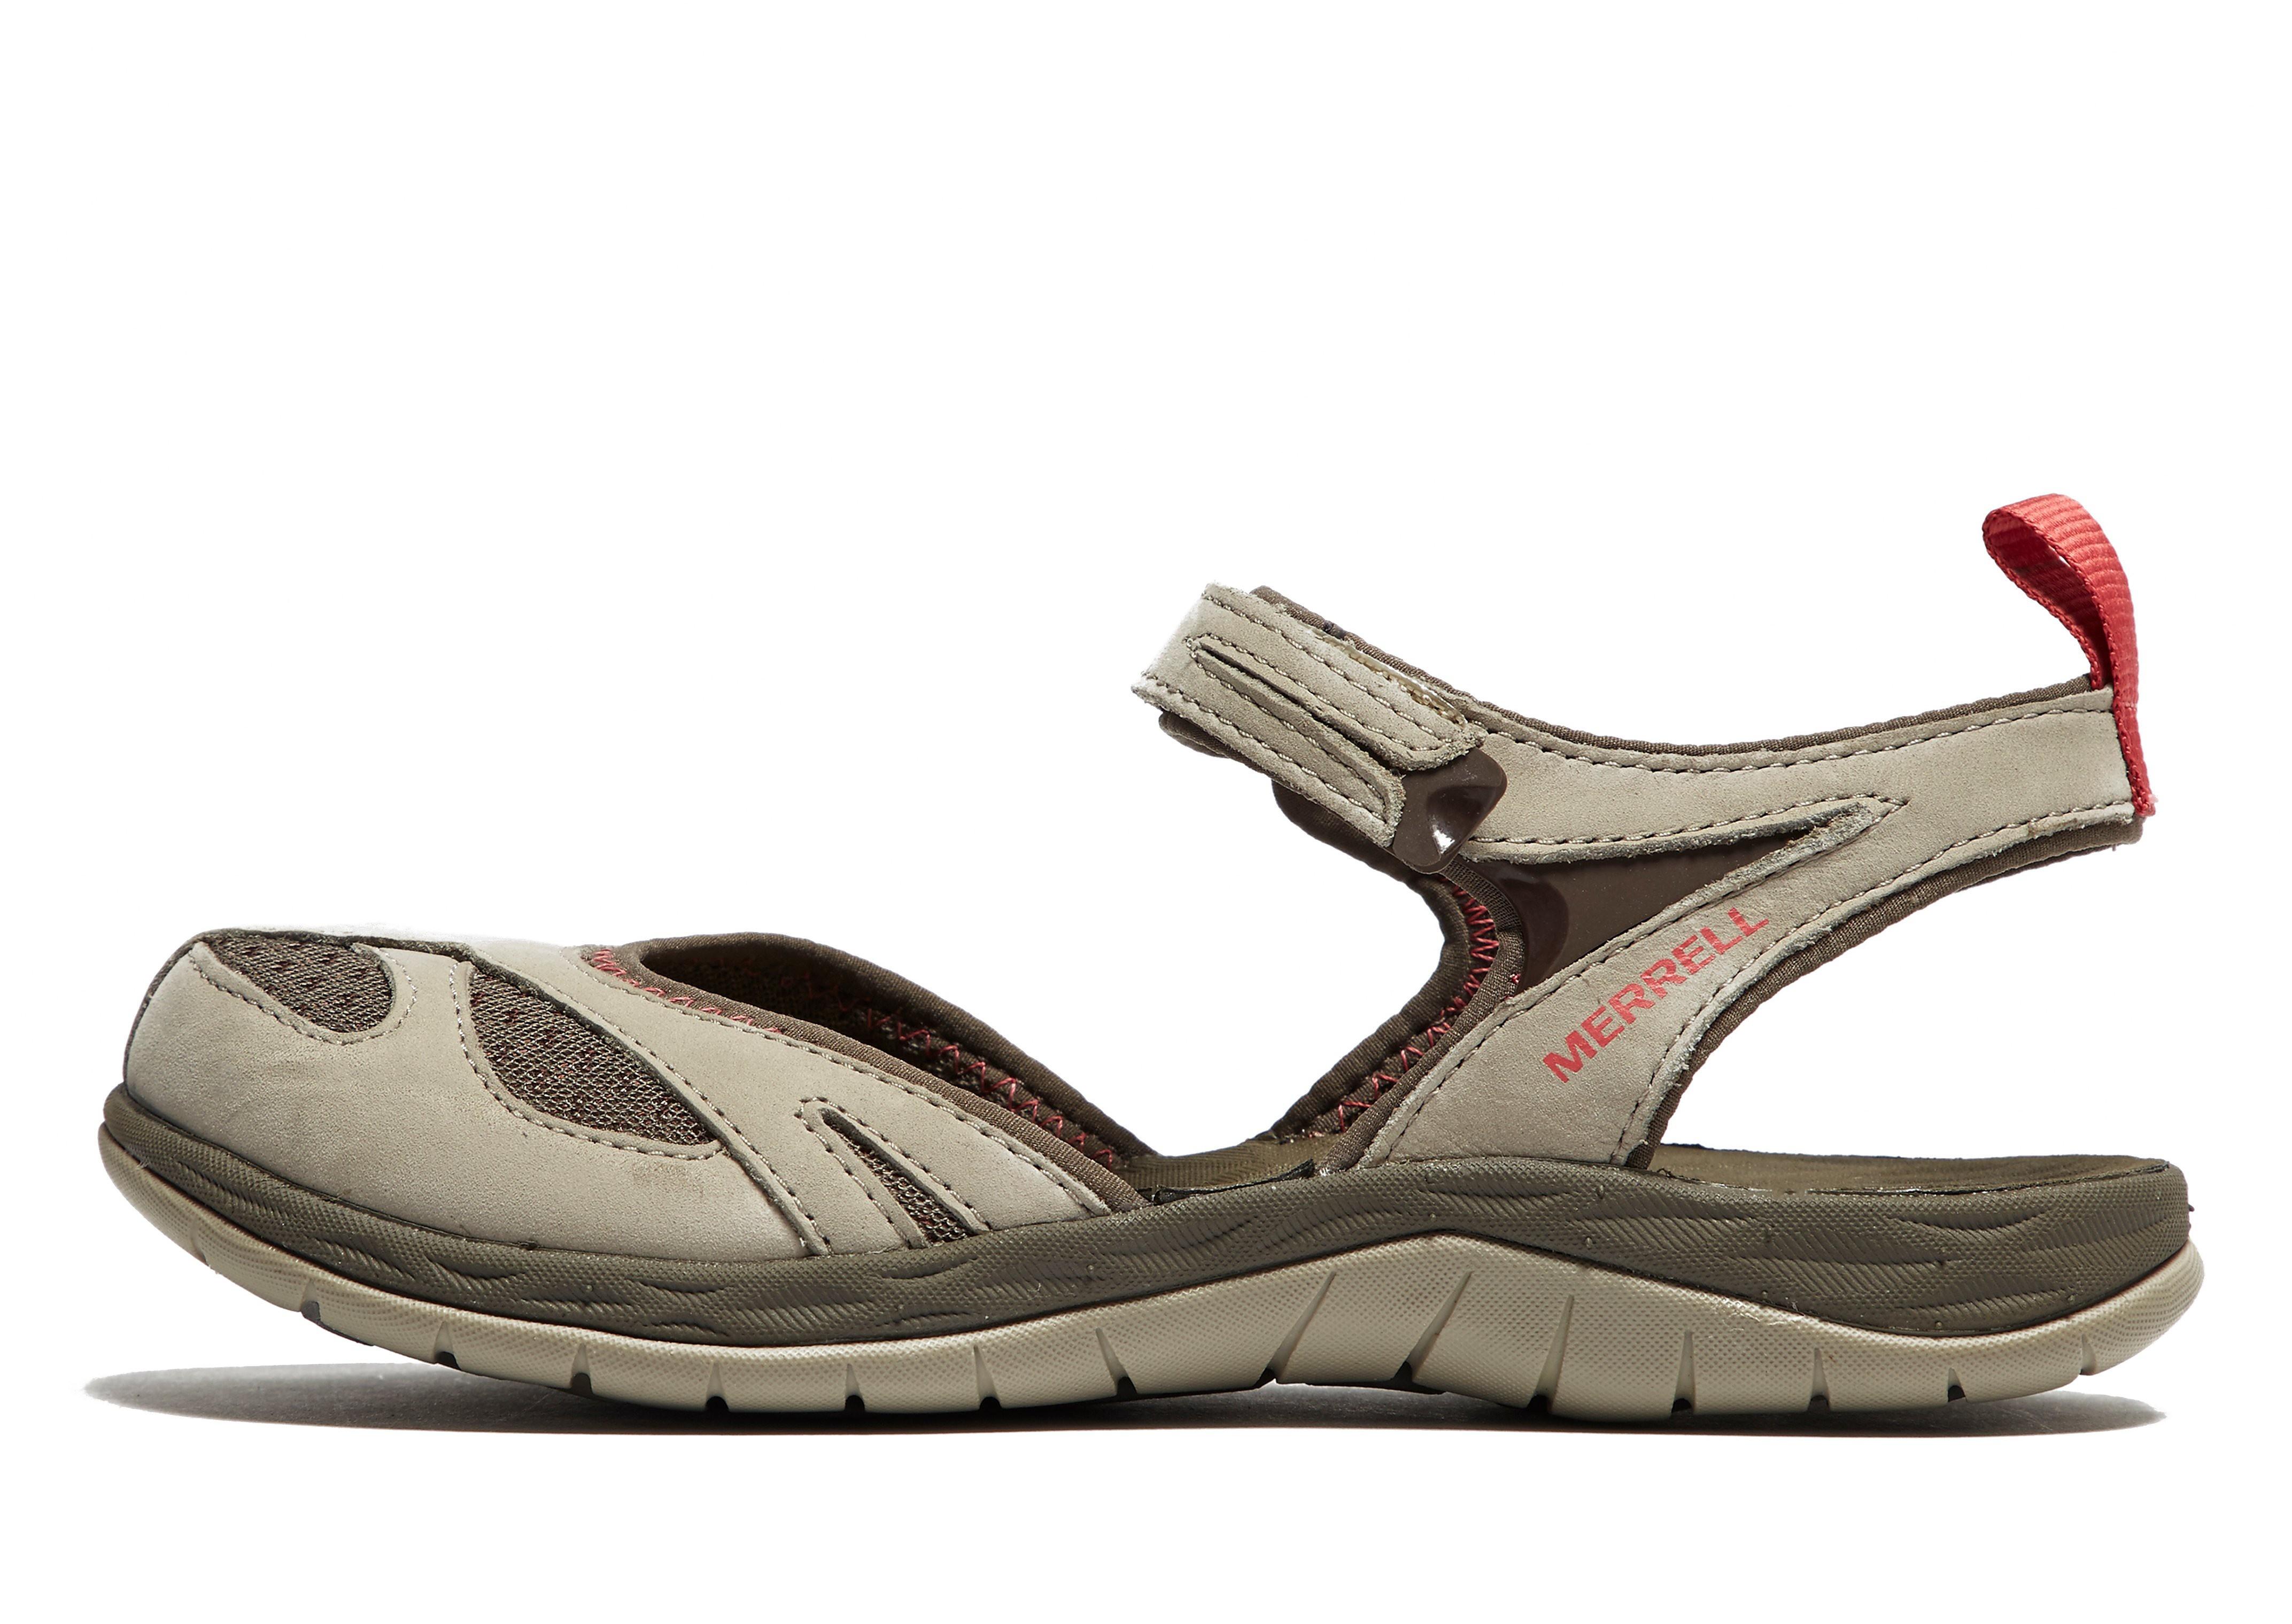 Merrell Siren Wrap Walking Sandals Women's